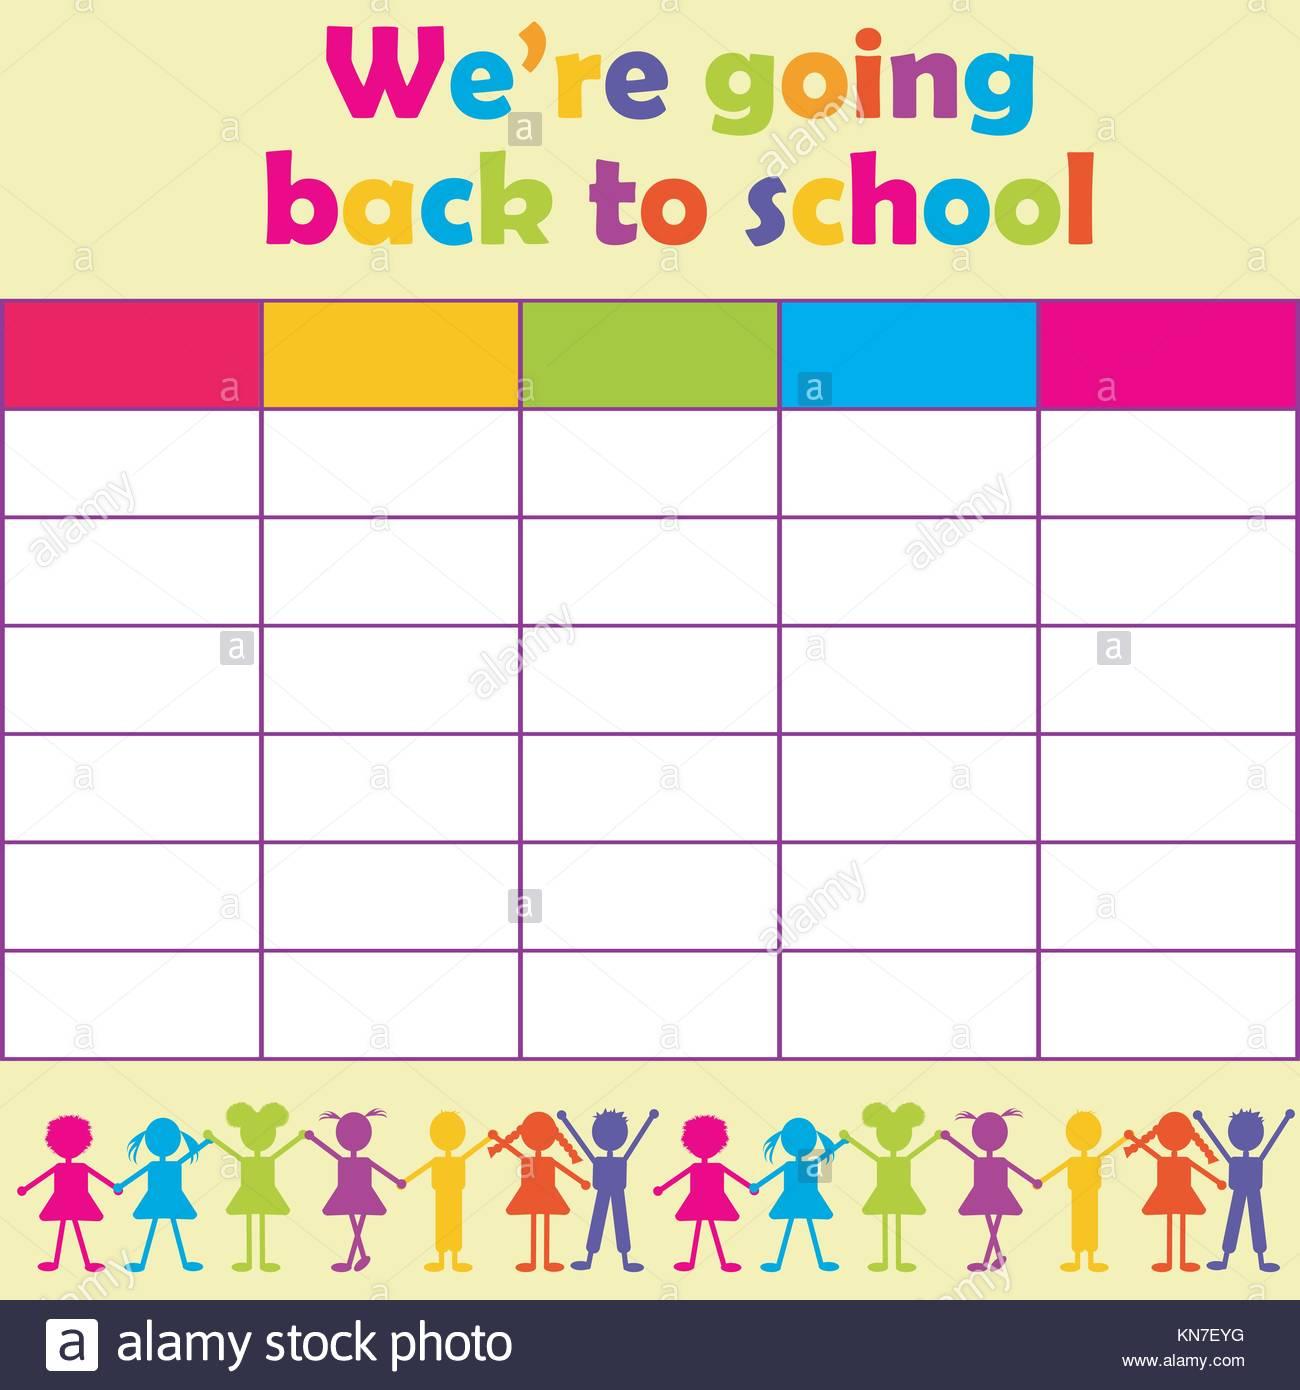 School Timetable Stockfotos & School Timetable Bilder - Alamy